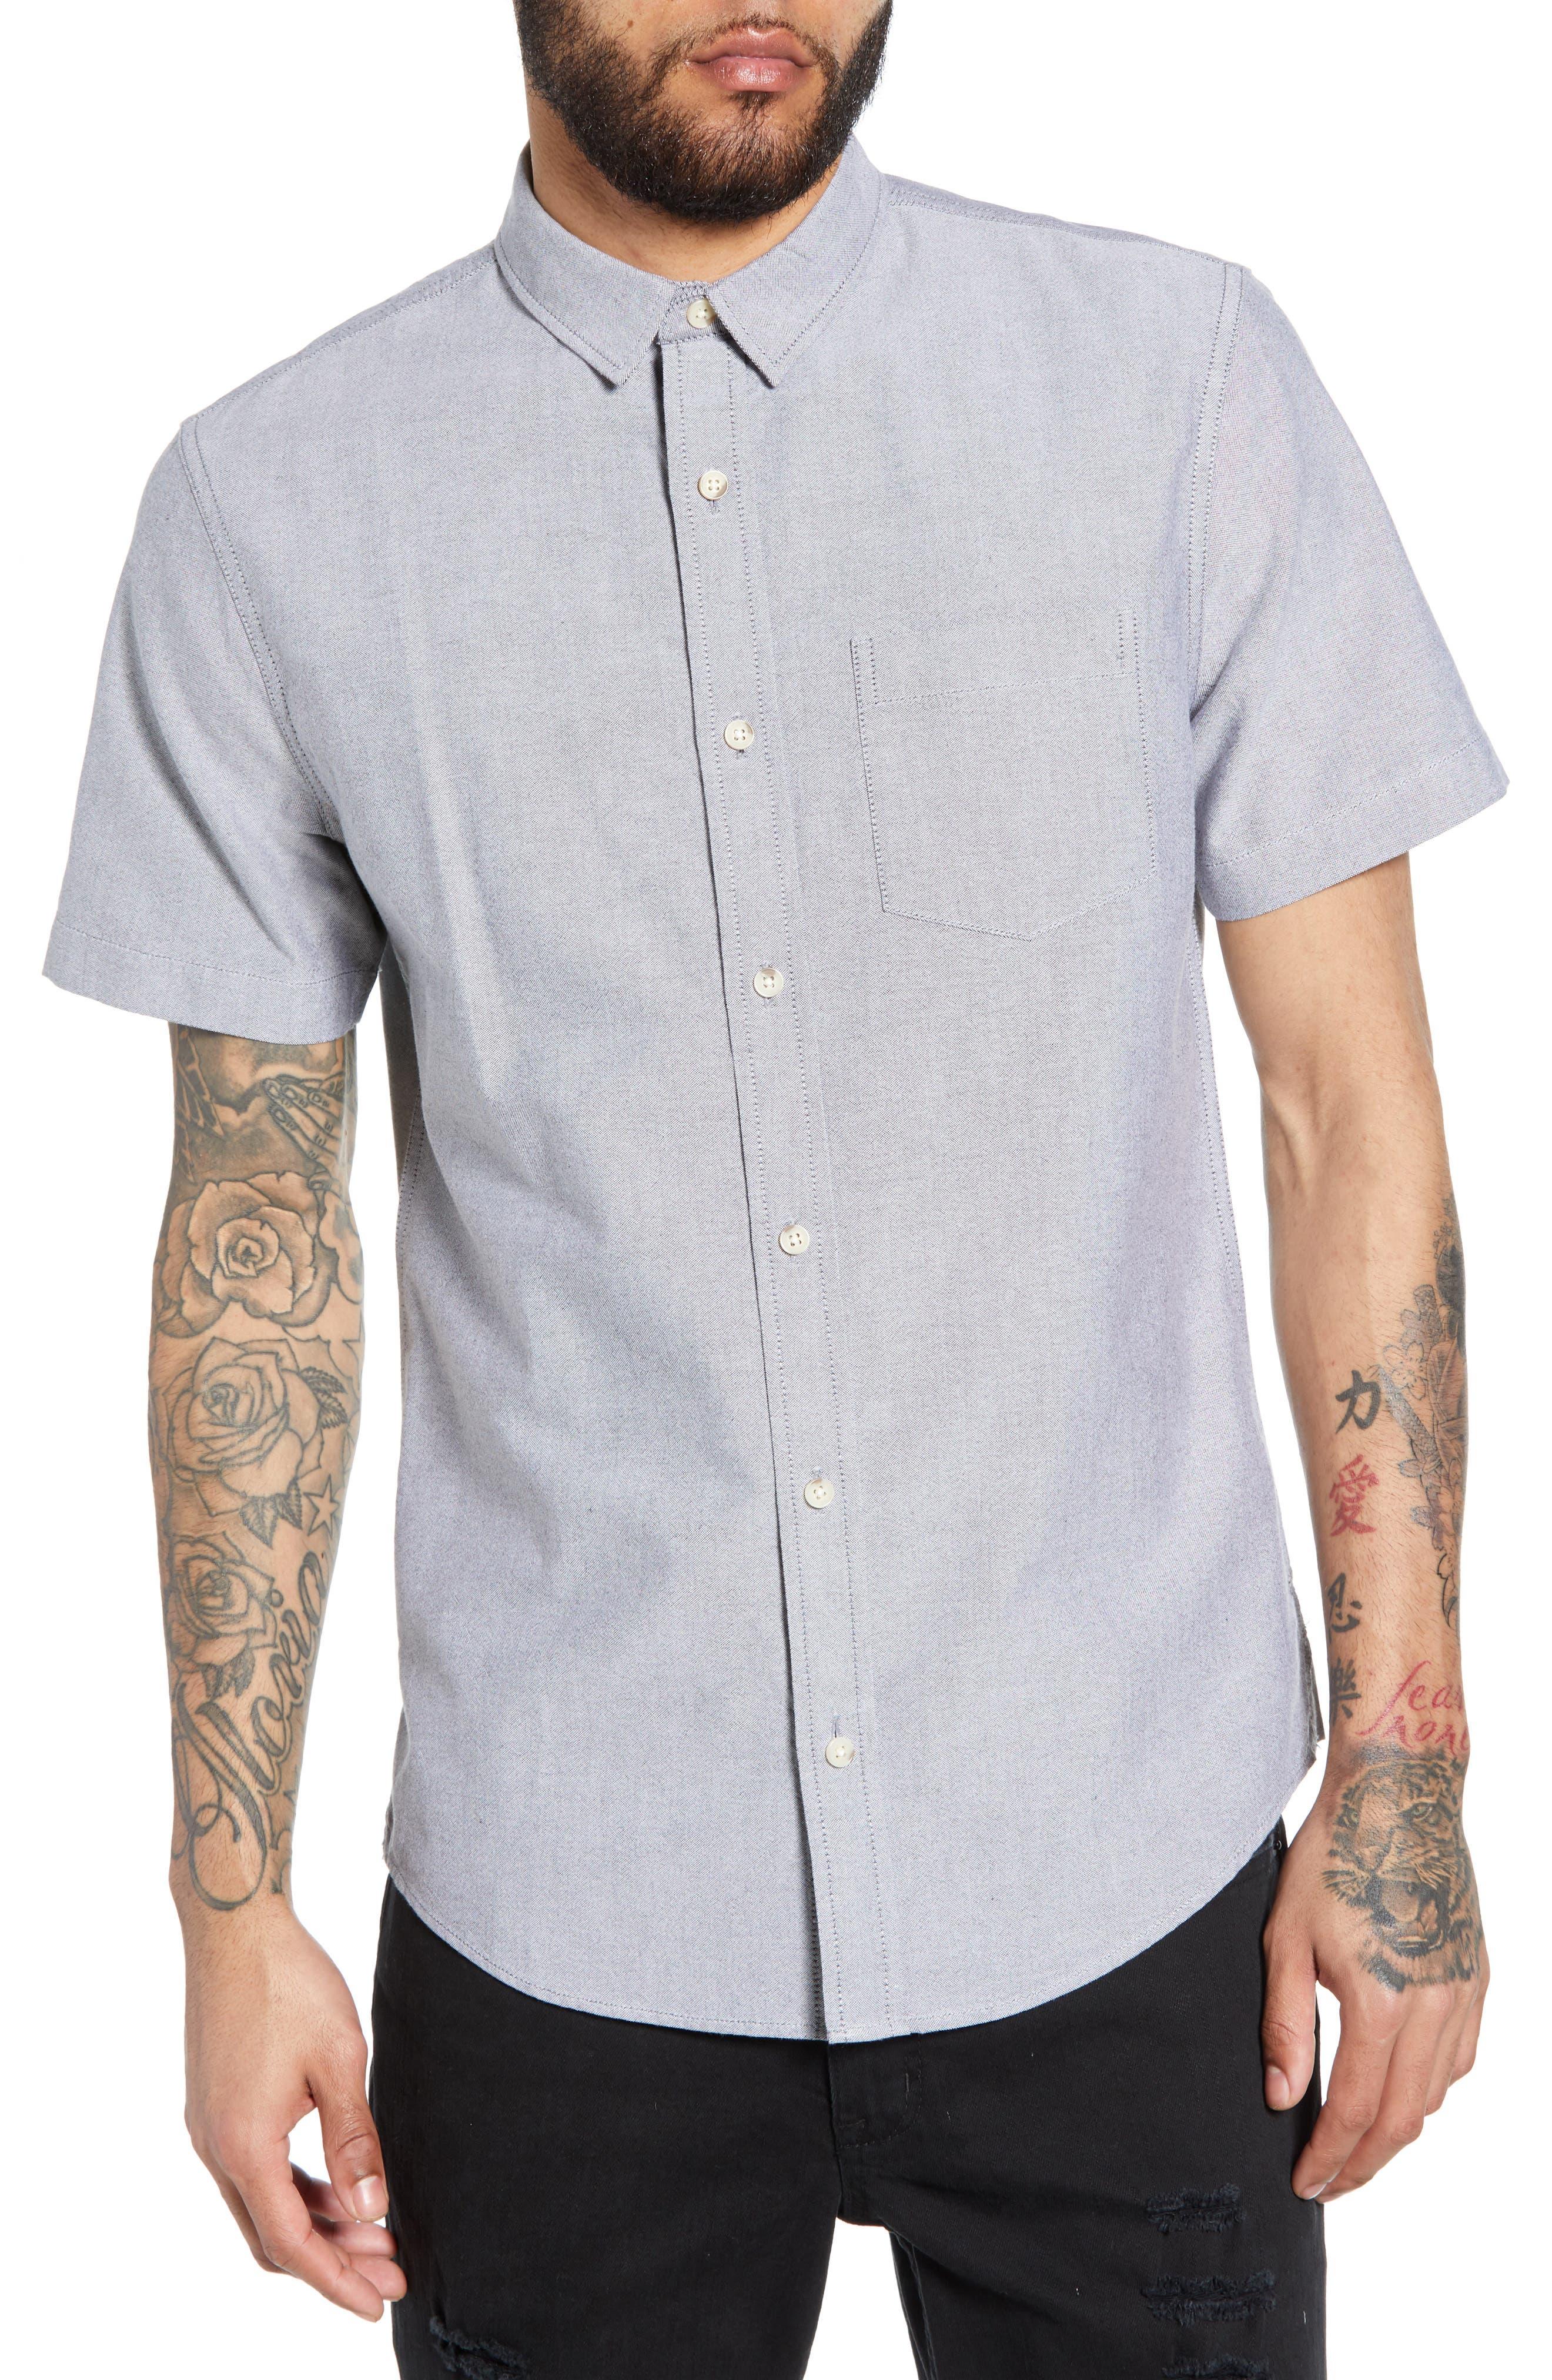 THE RAIL Oxford Cloth Woven Shirt, Main, color, BLACK ROCK-WHITE